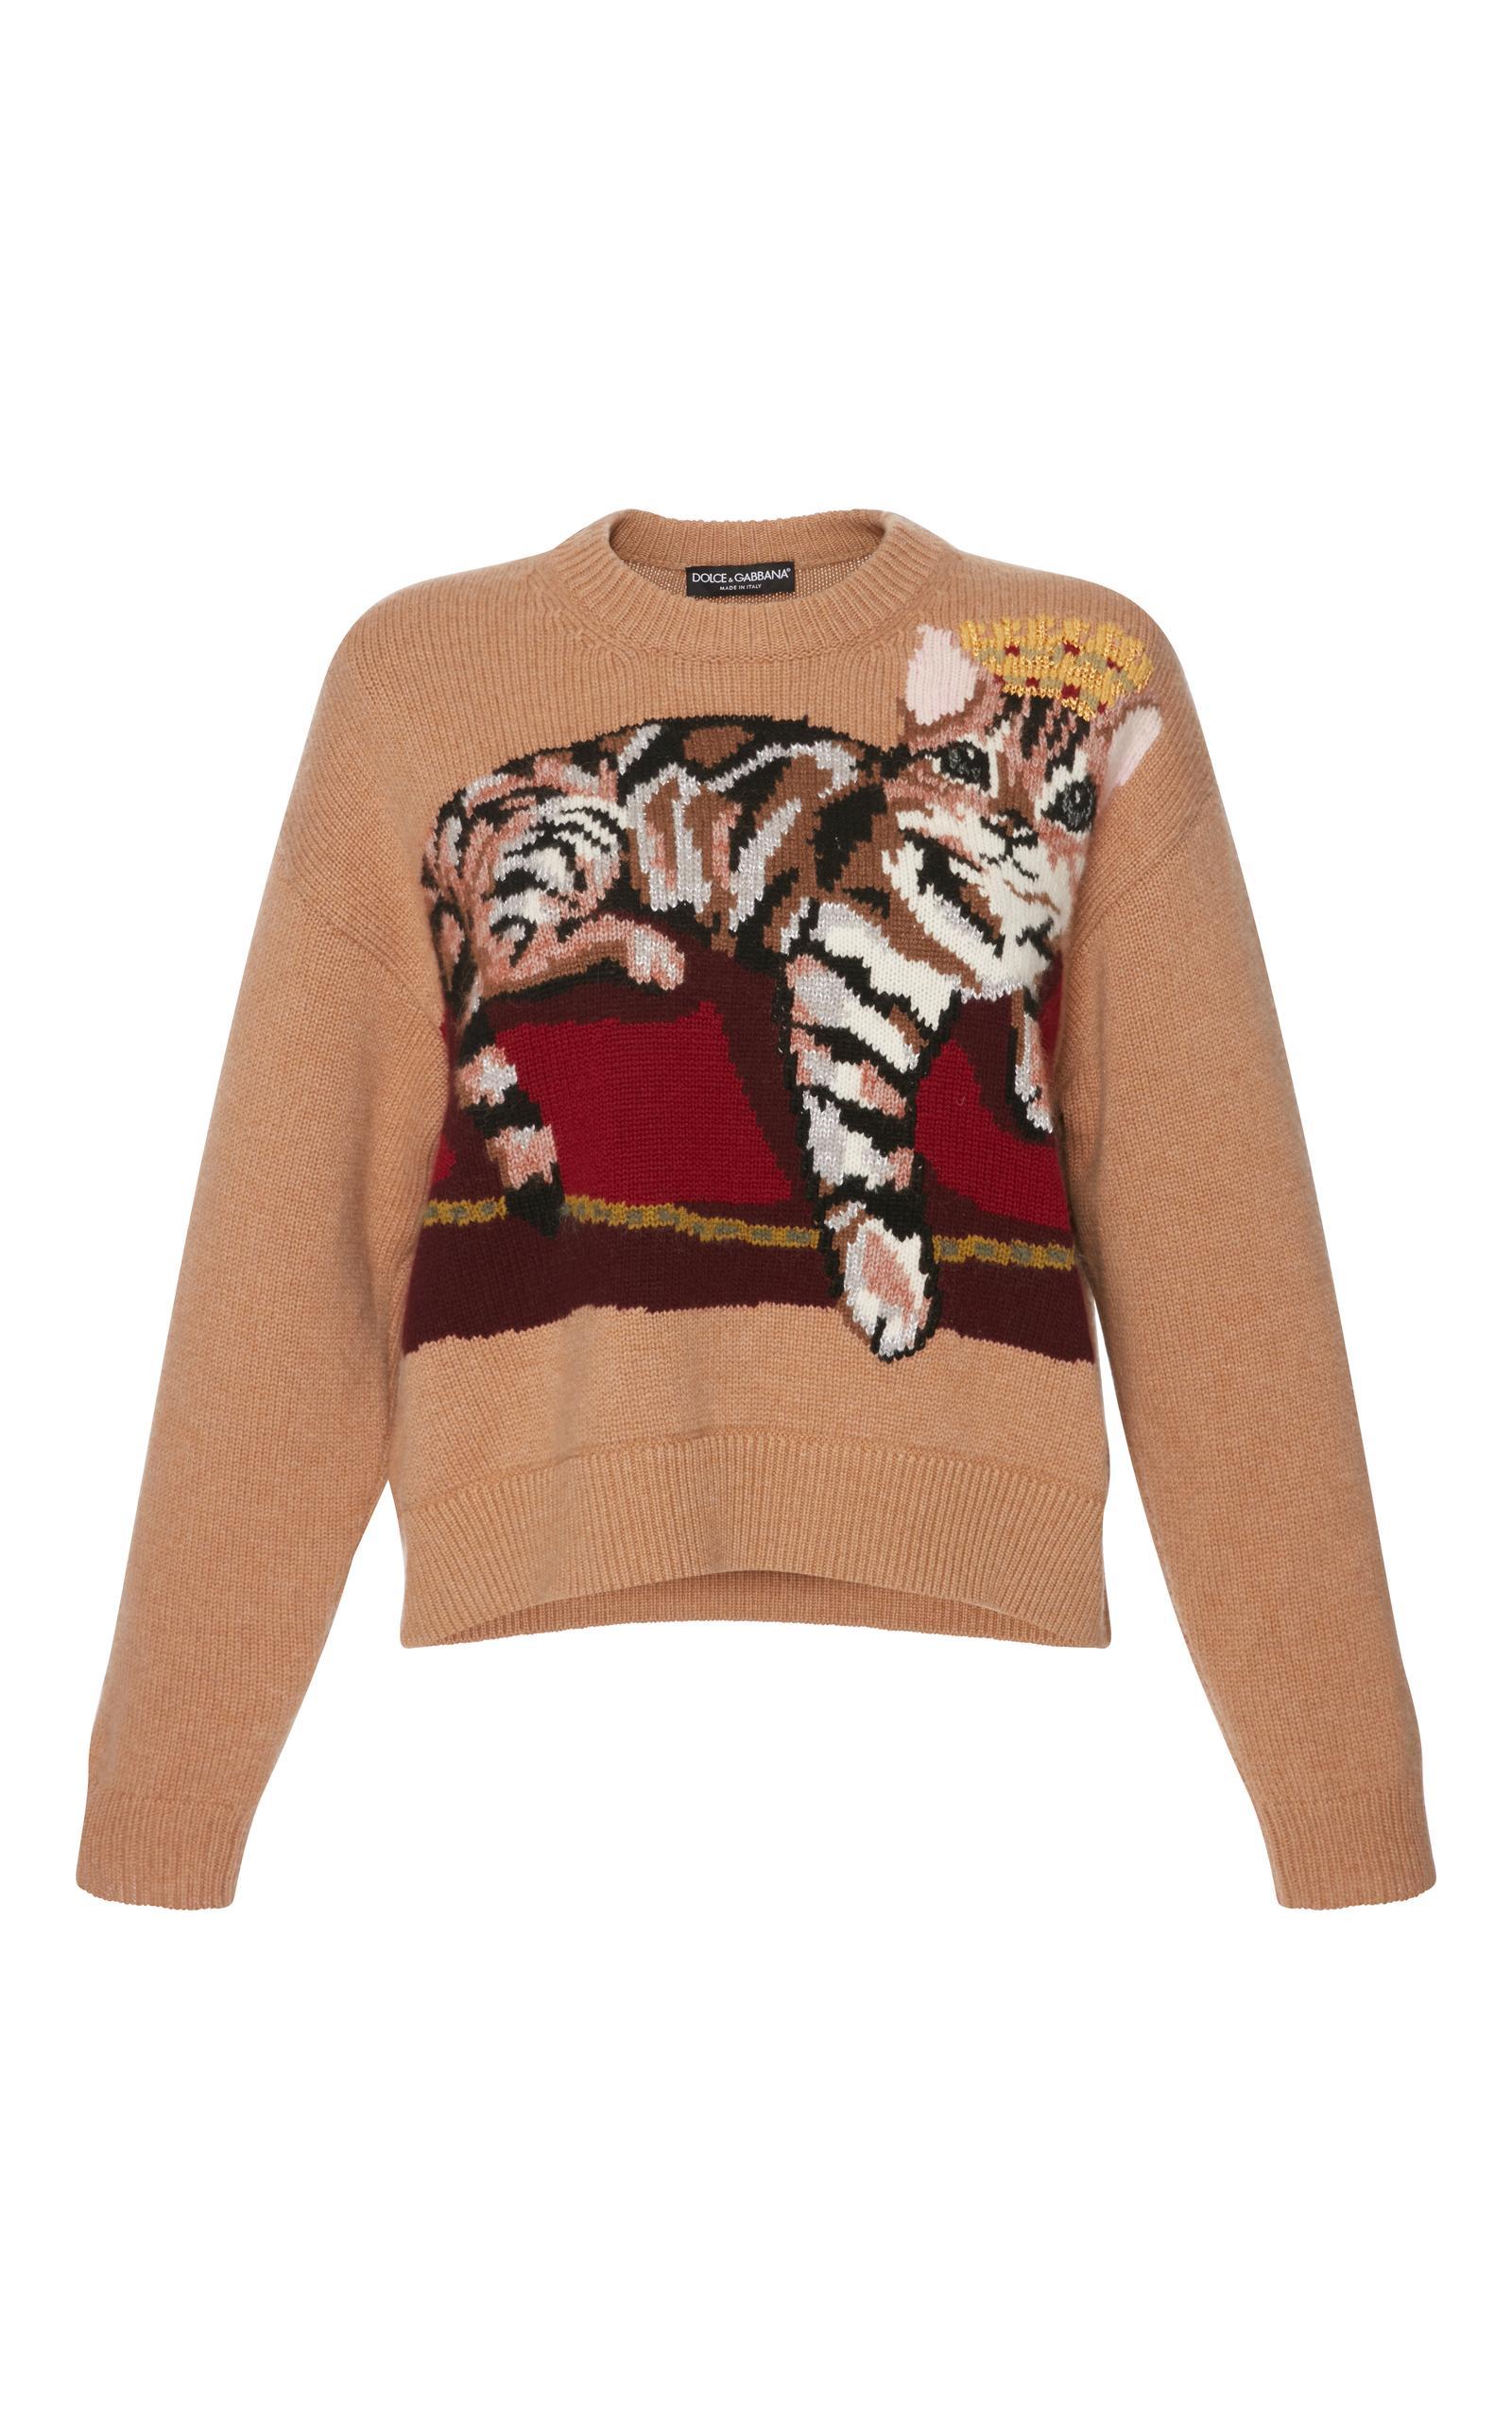 db6f999ffc97e3 Dolce & Gabbana Dolce And Gabbana Tan Cashmere Crowned Bengal Cat Sweater  In S9005 Camel Multi